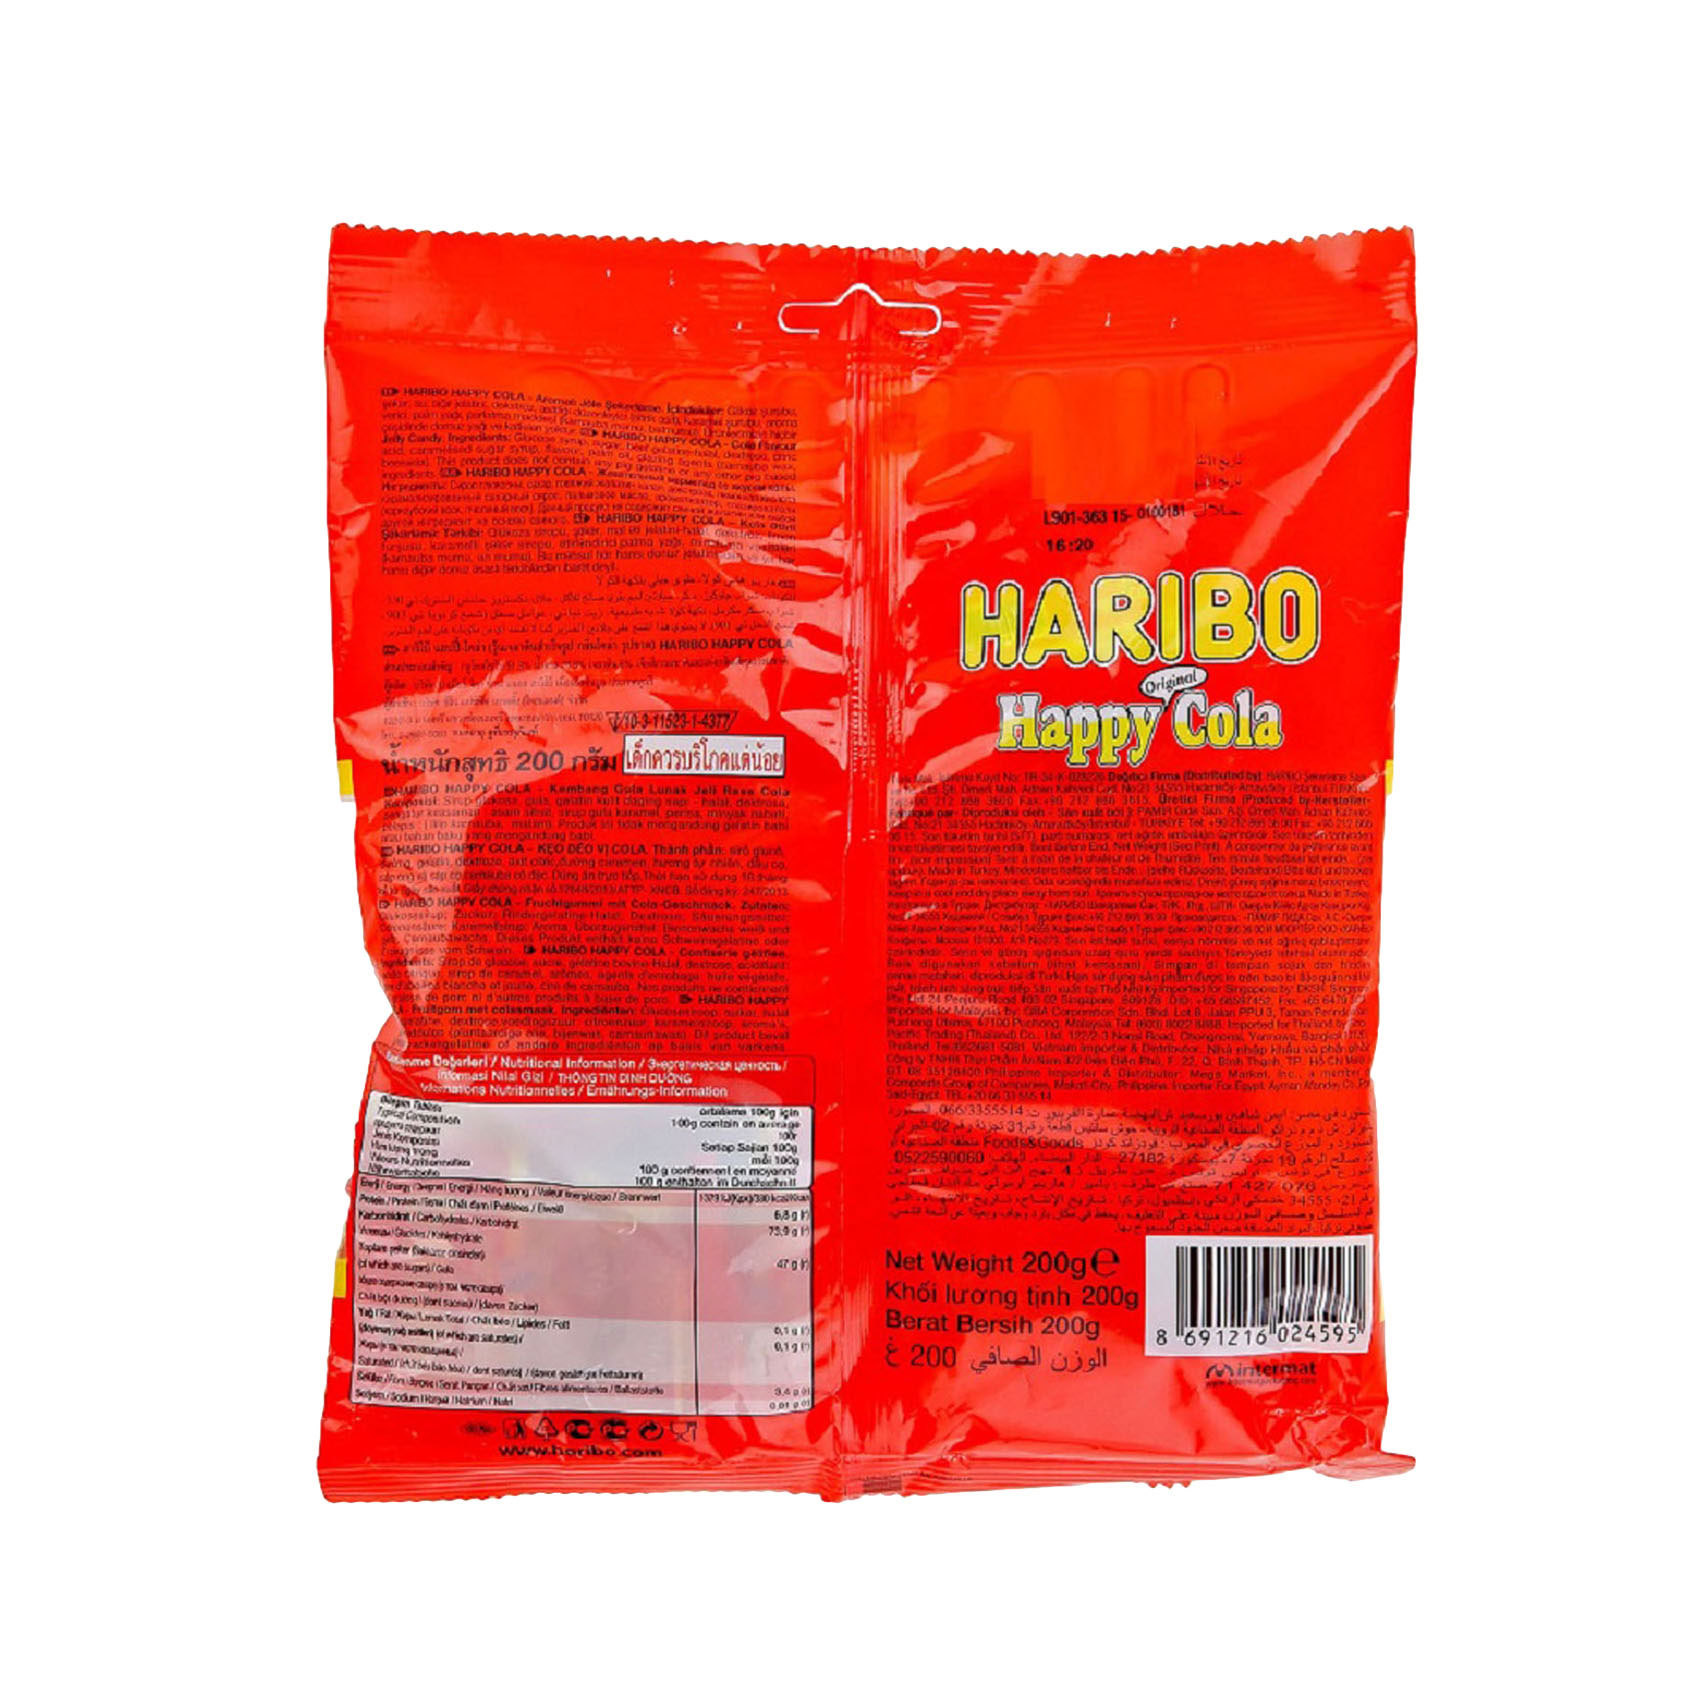 HARIBO HAPPY COLA 20'S 200GR